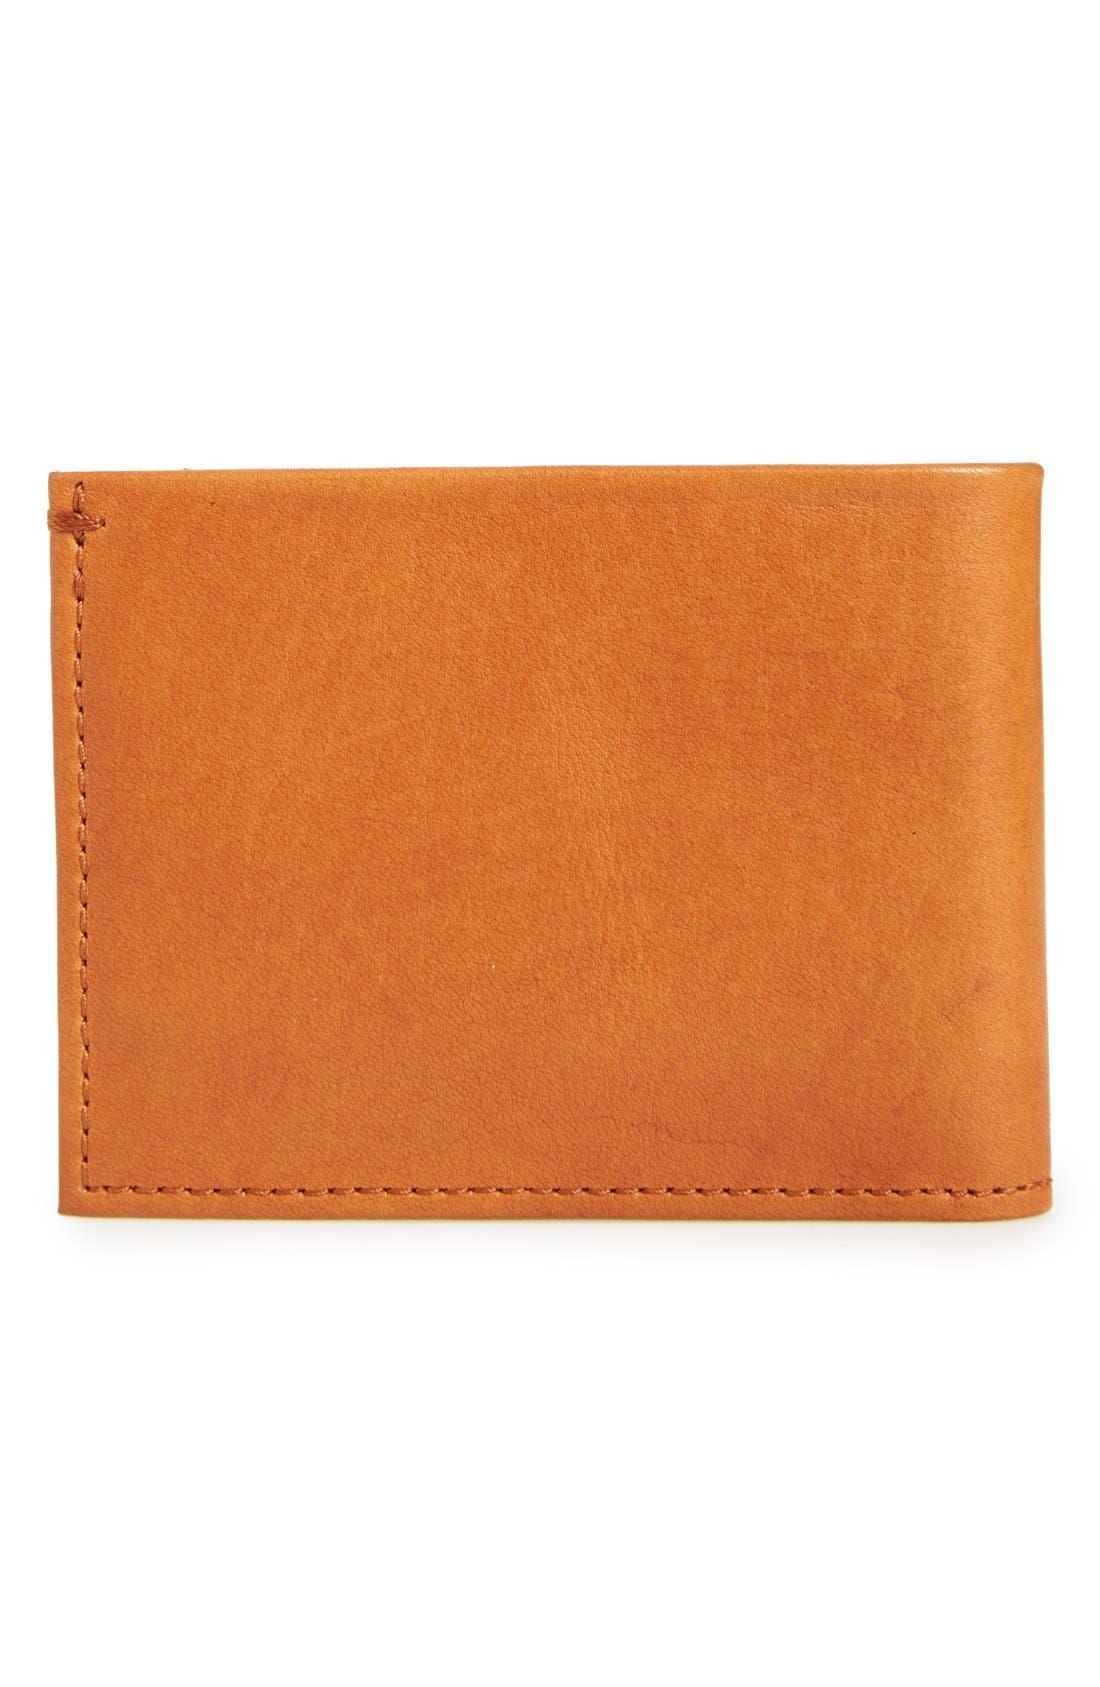 Slim Bifold Leather Wallet,                             Alternate thumbnail 4, color,                             BOURBON